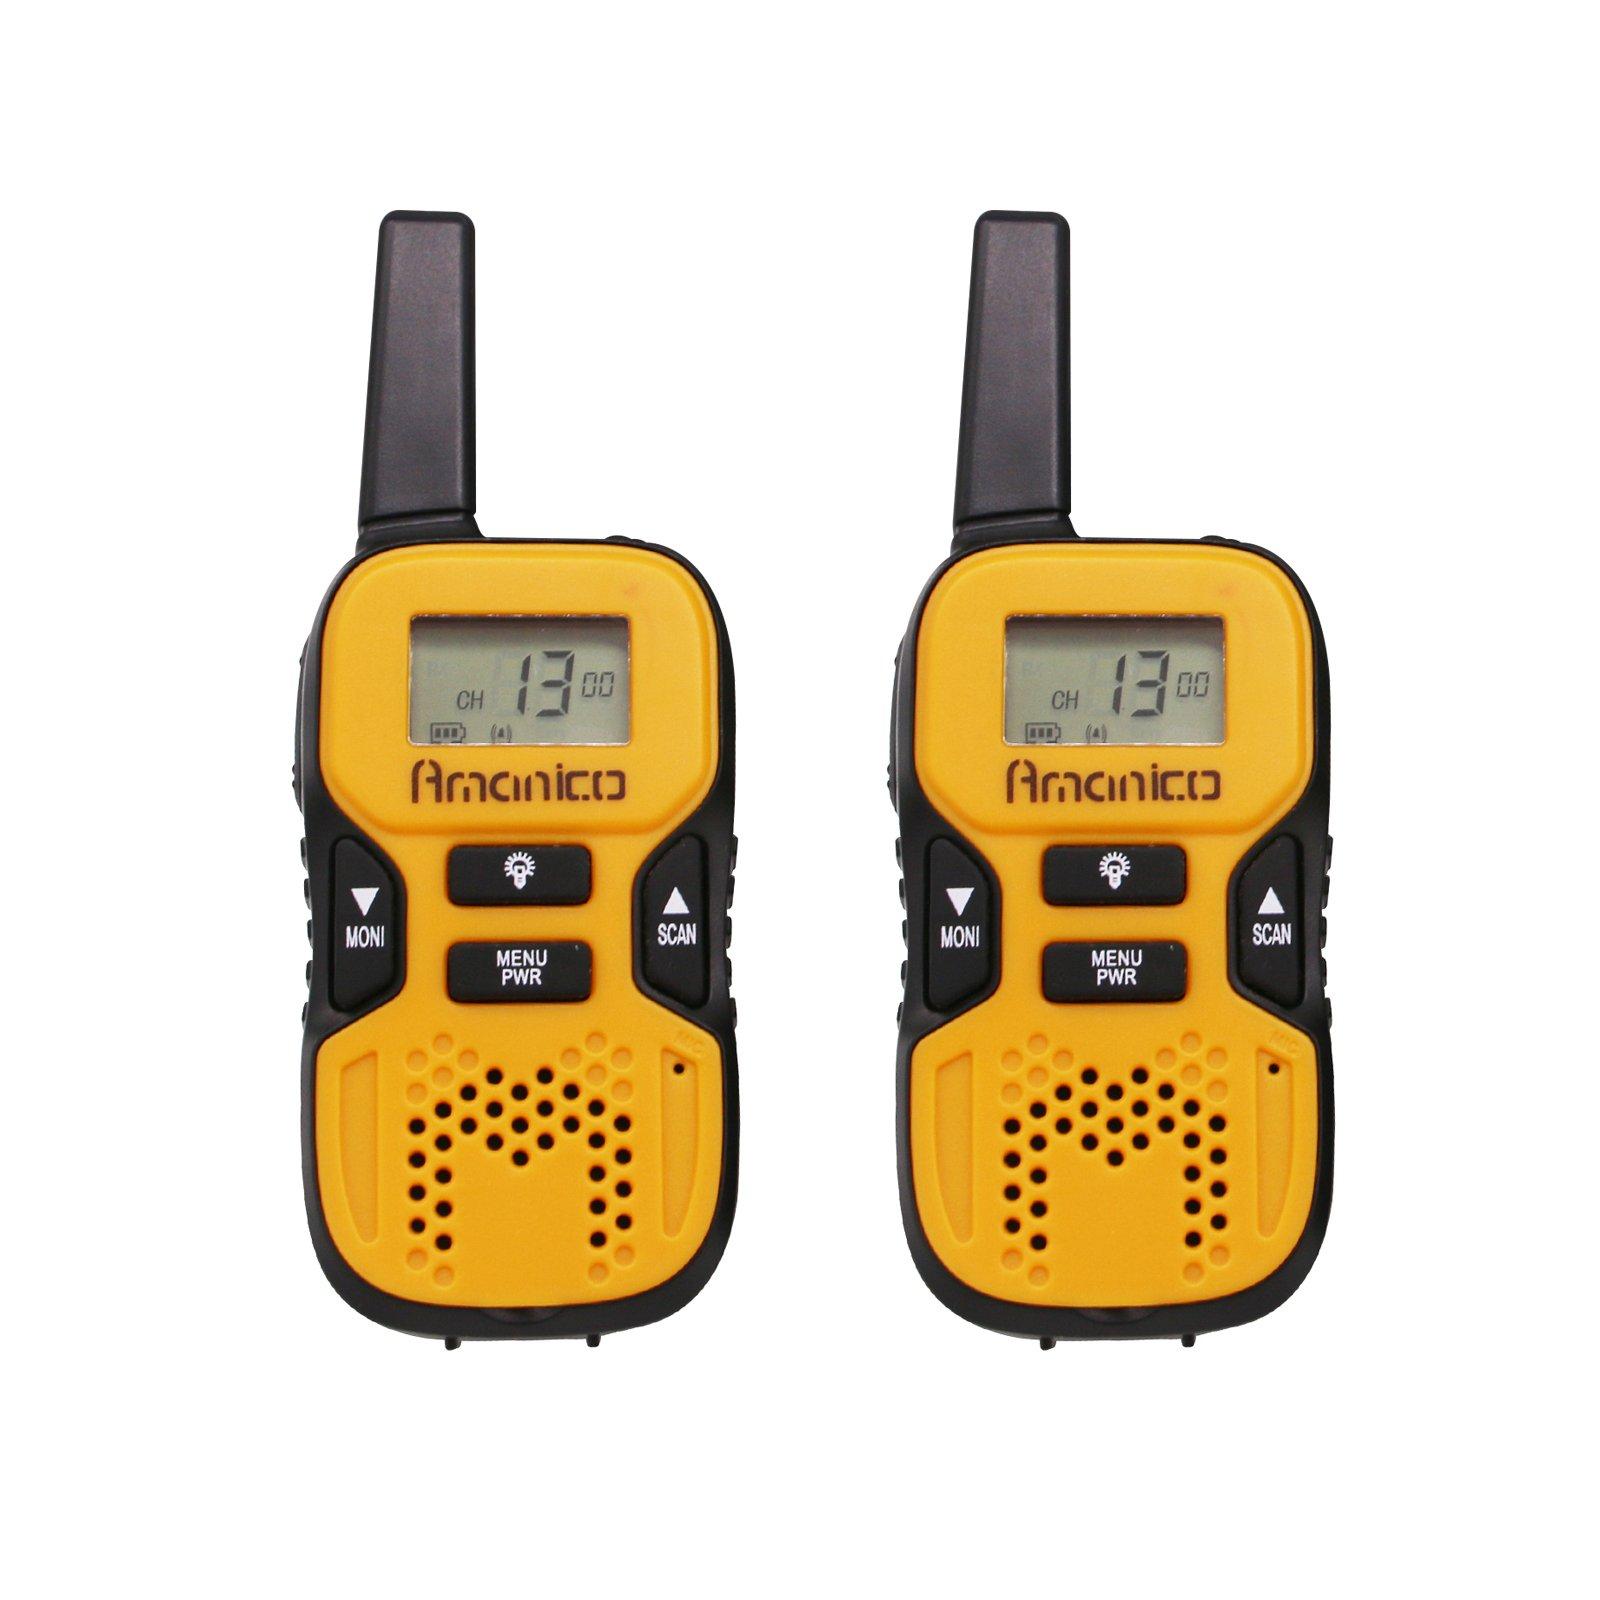 Amanico Kids Walkie Talkies, 22 Channel FRS/GMRS 2 Way Radio 2 miles (up to 3.7 Miles) UHF Handheld Smart & Mini Size 3.3 In Length for girls boys Kids Children Teens (1 Pair), Orange